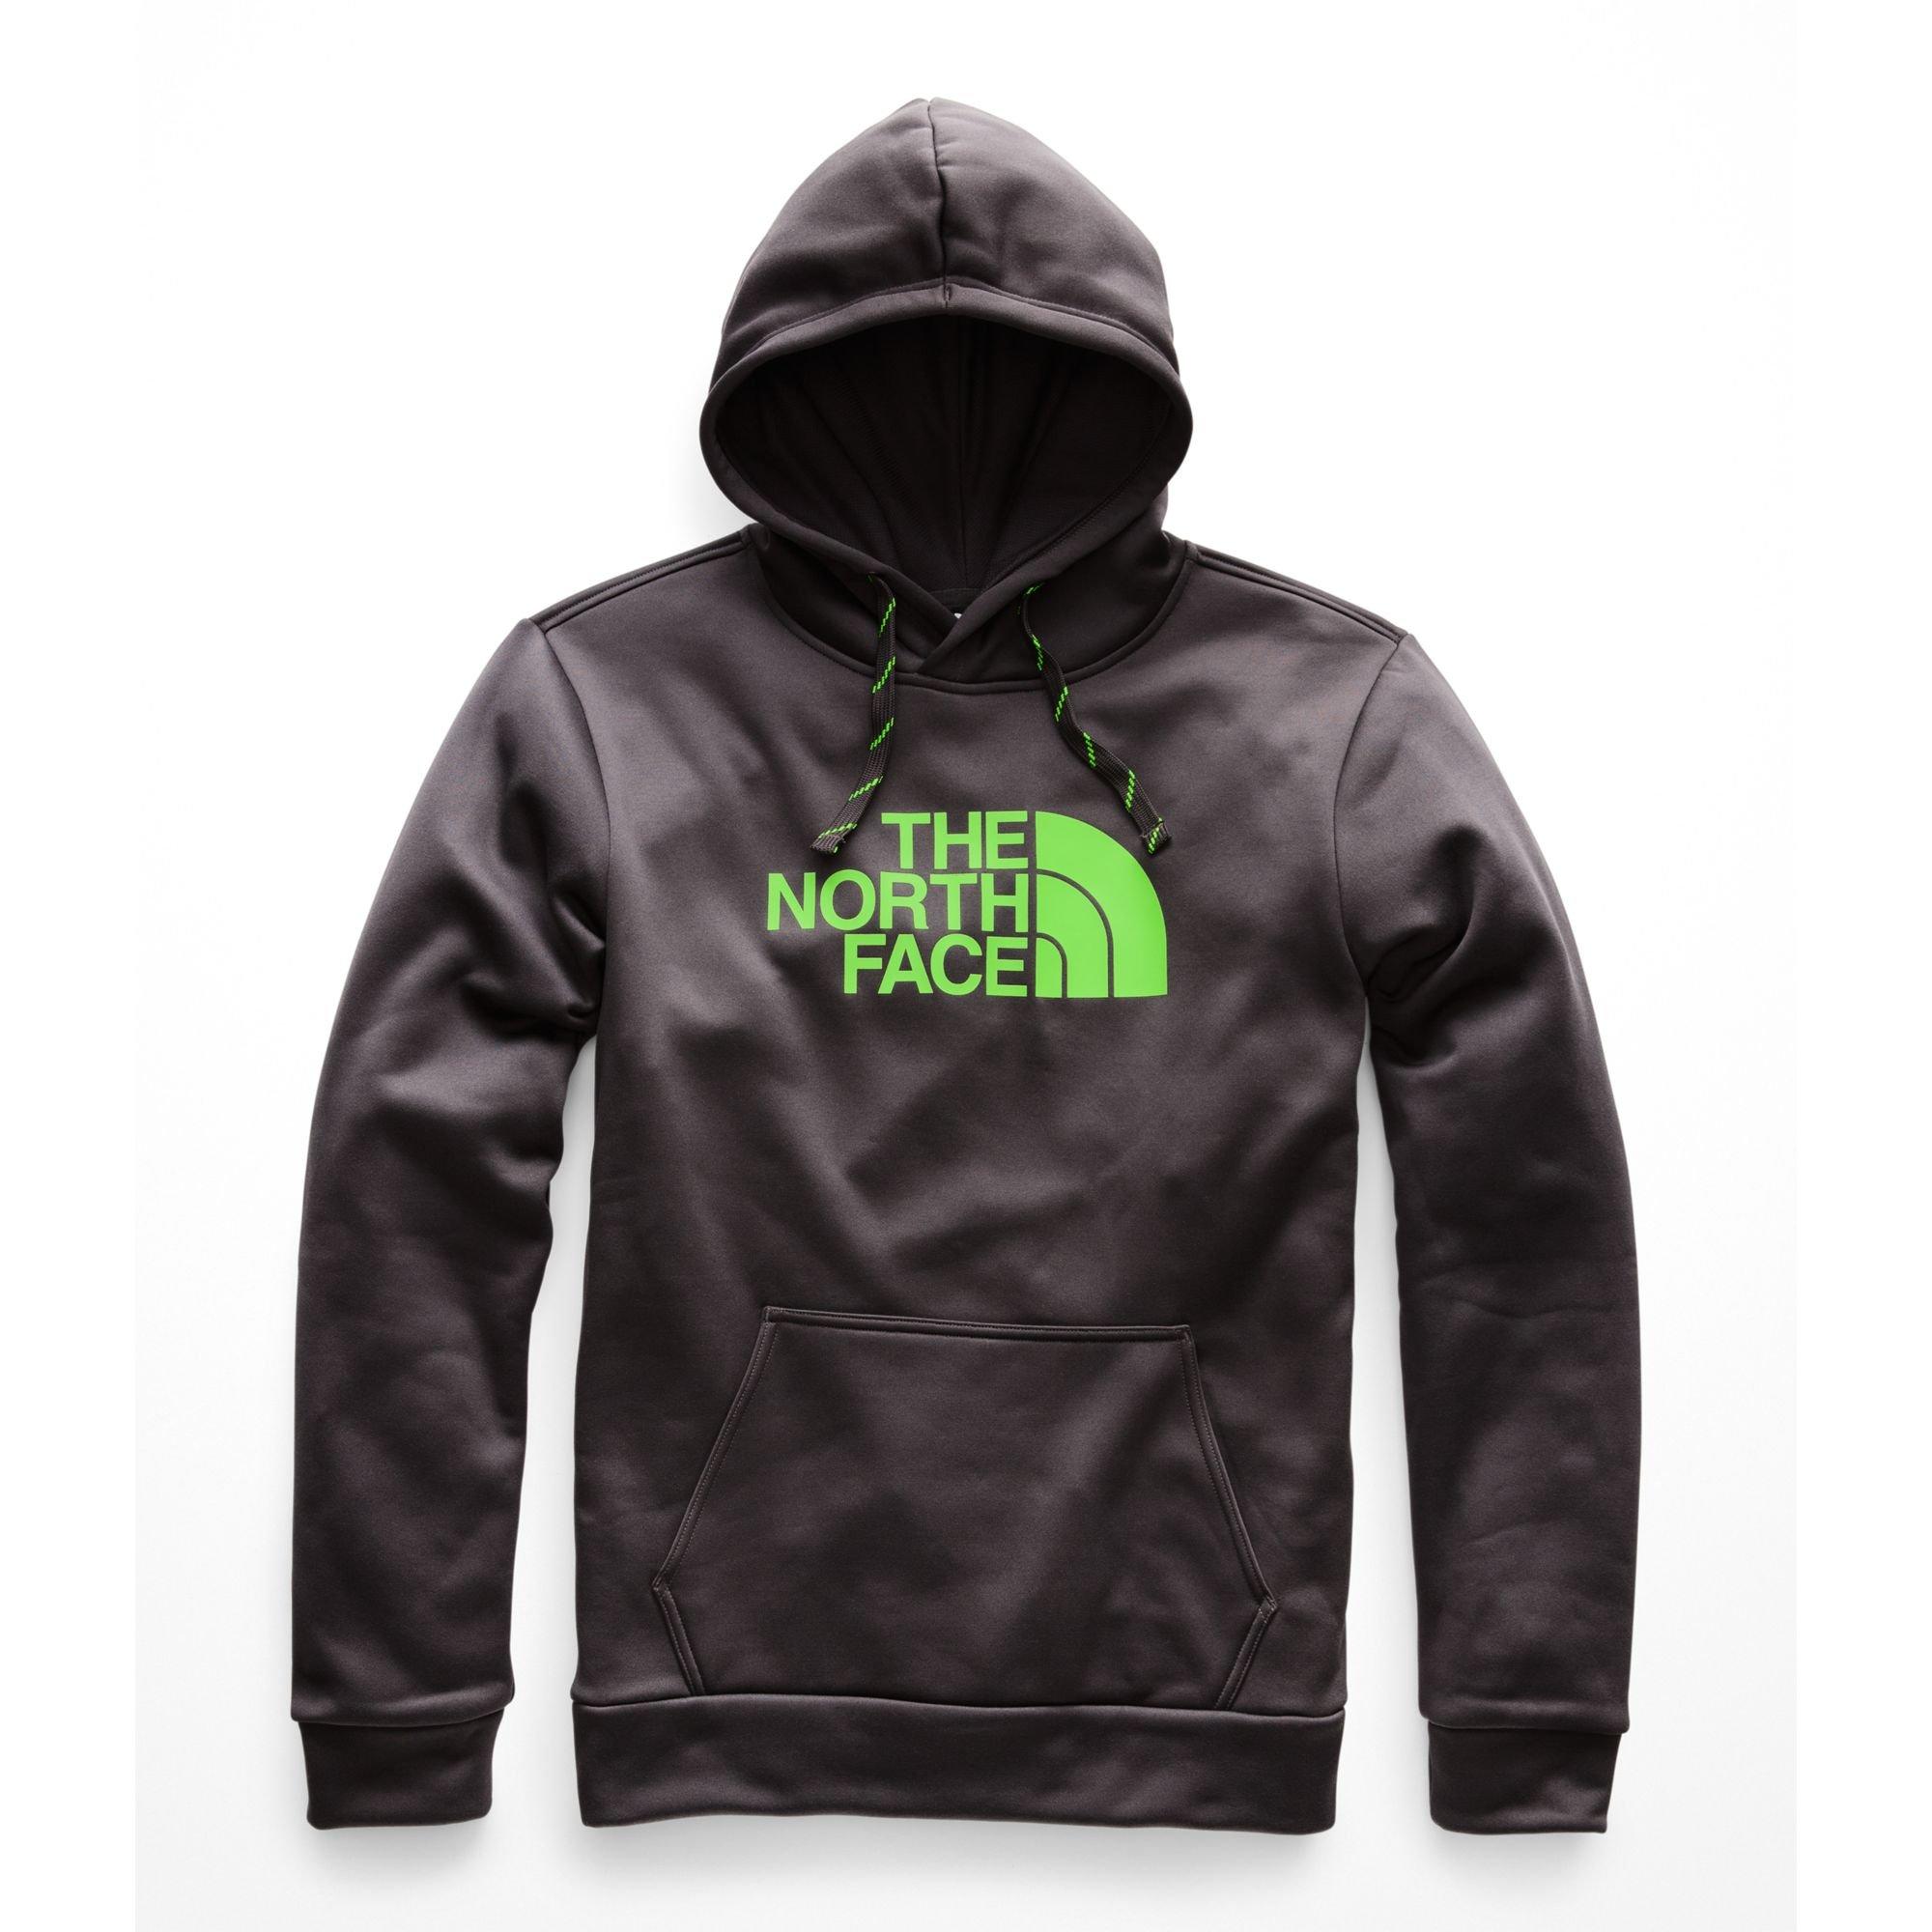 The North Face Men's Surgent Pullover Half Dome Hoodie - Asphalt Grey & Power Green - XL